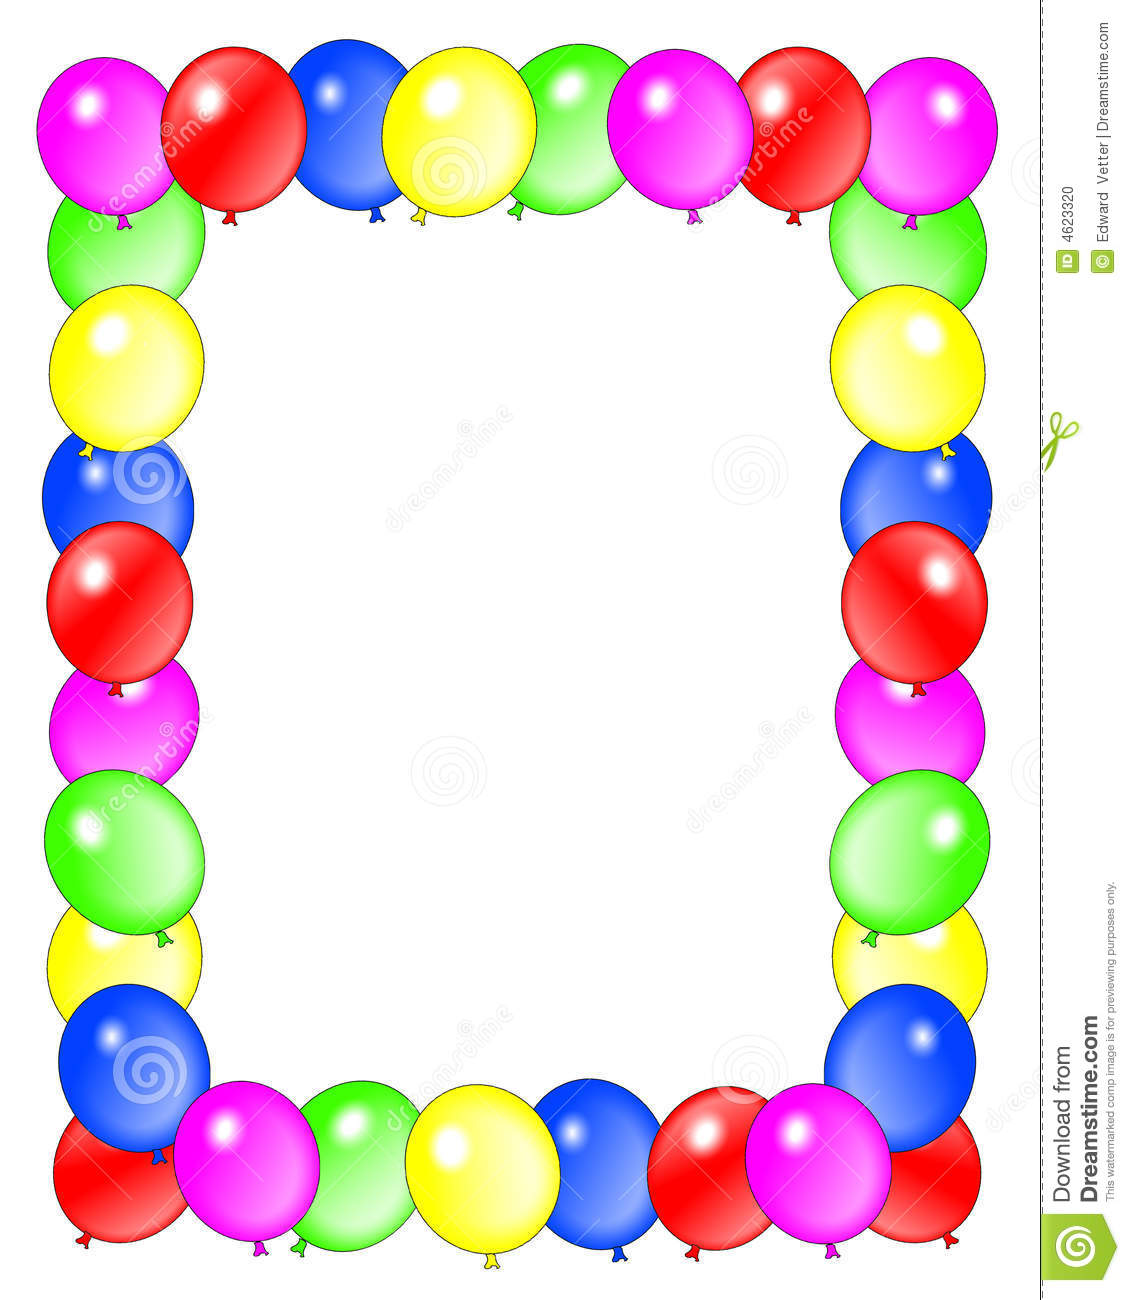 1130x1300 Balloon Borders Clipart